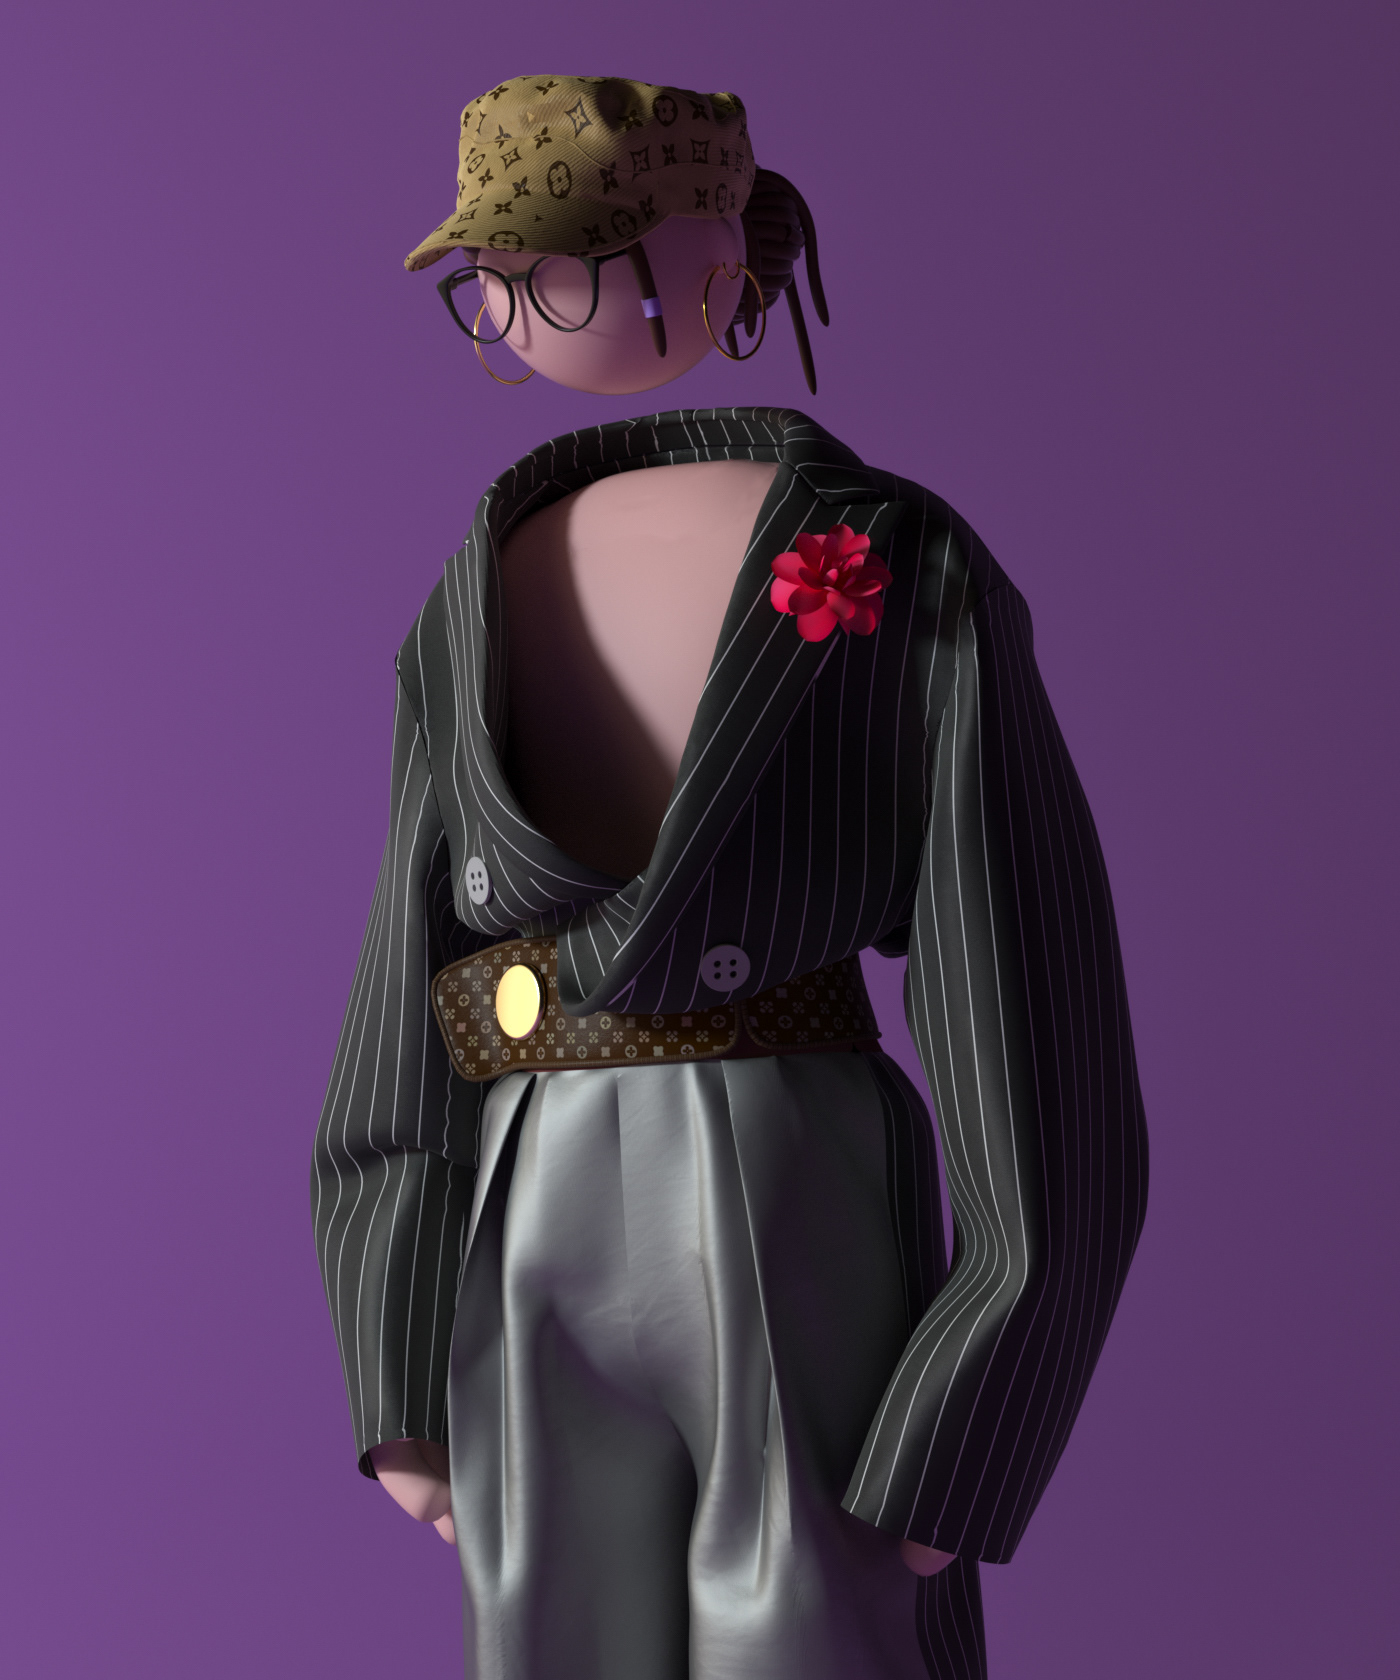 c4d clothing design IP MD model the lens